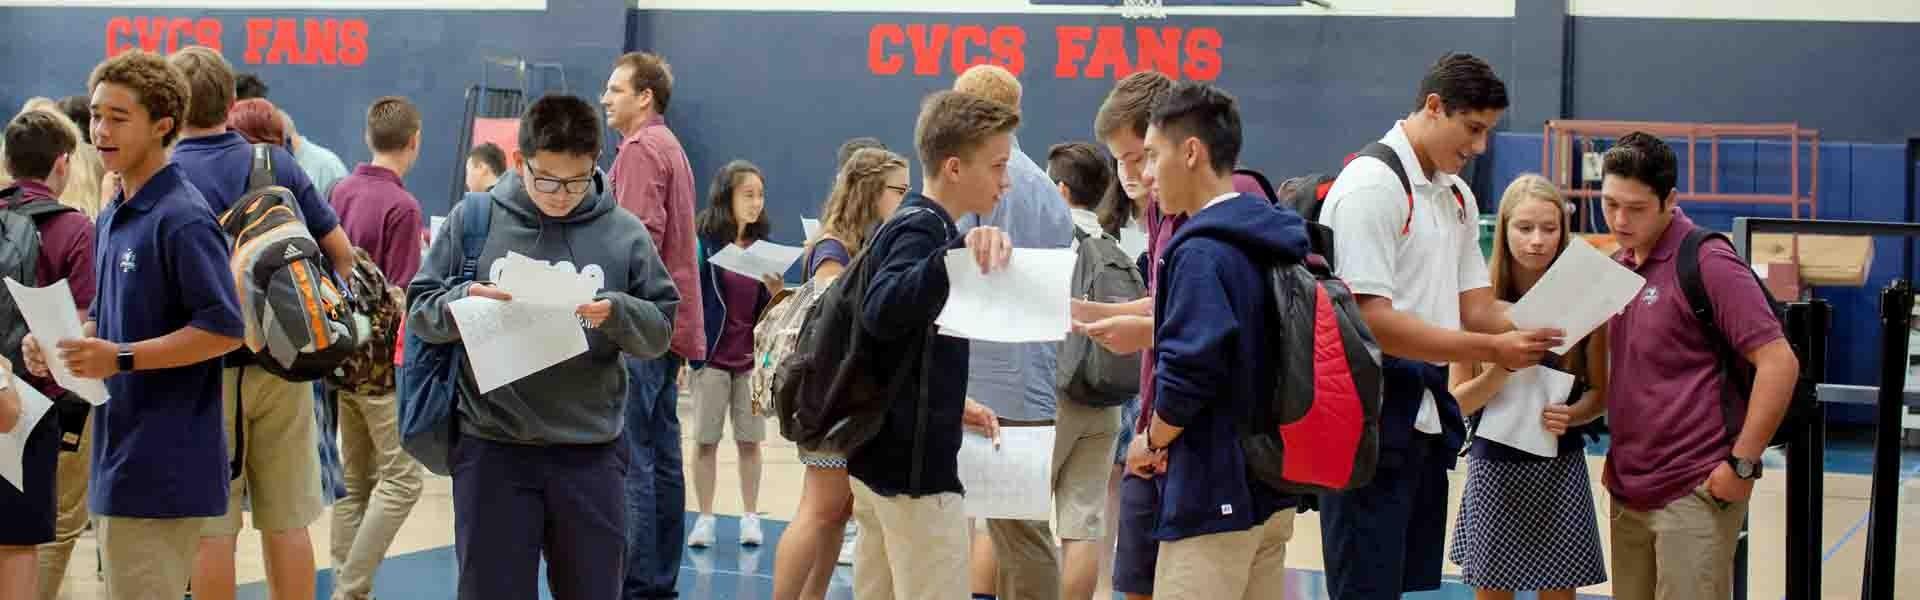 Capistrano California USA Students Banner 2019